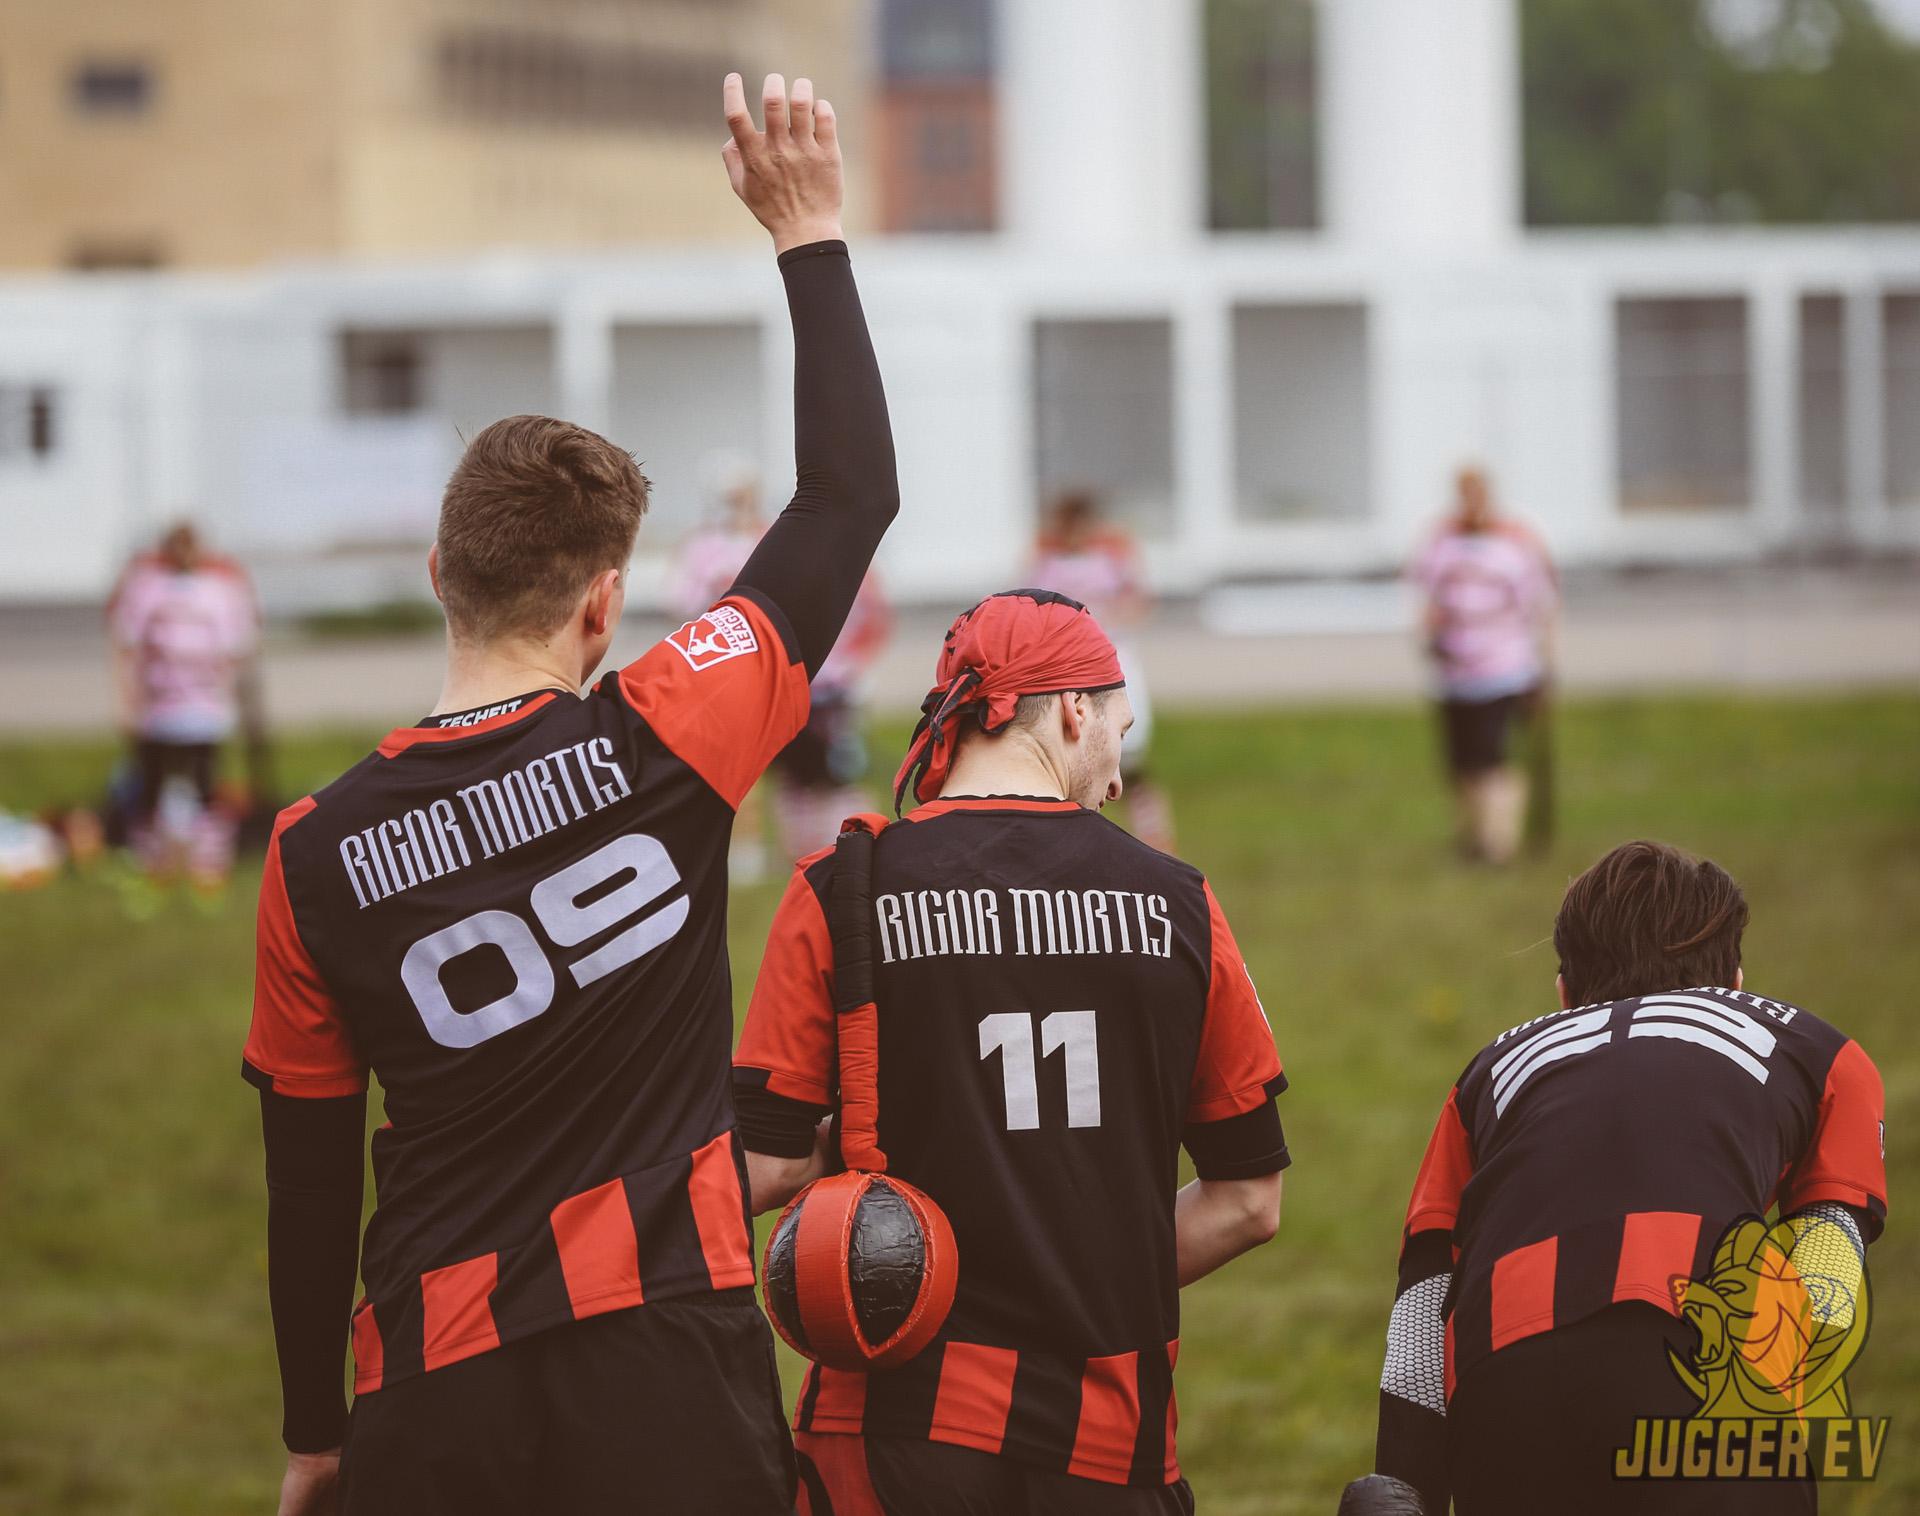 Berliner_Jugger_Pokal_2017-40